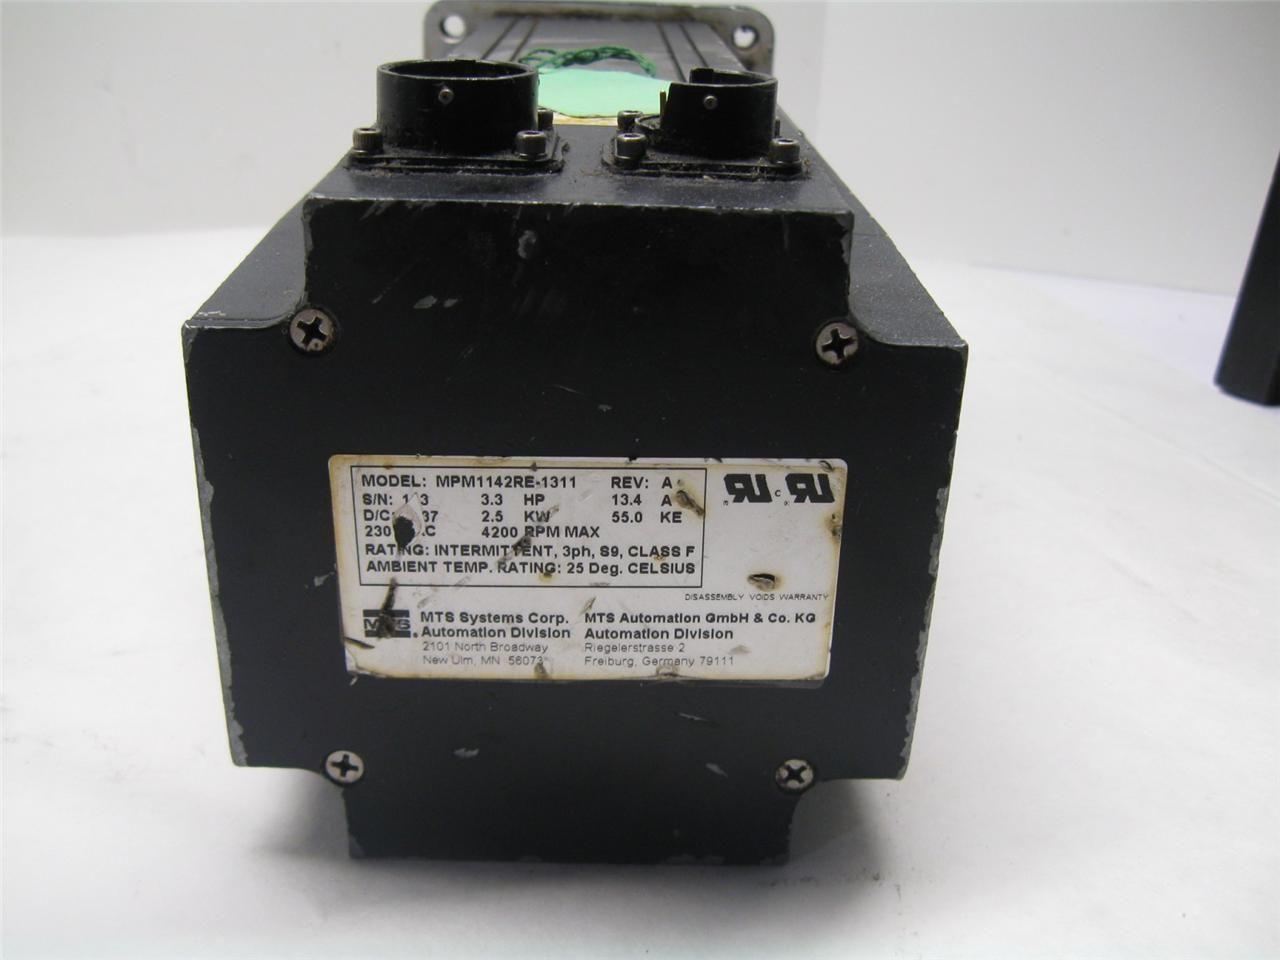 Servo Motor System : Mts systems mpm re servo motor ebay